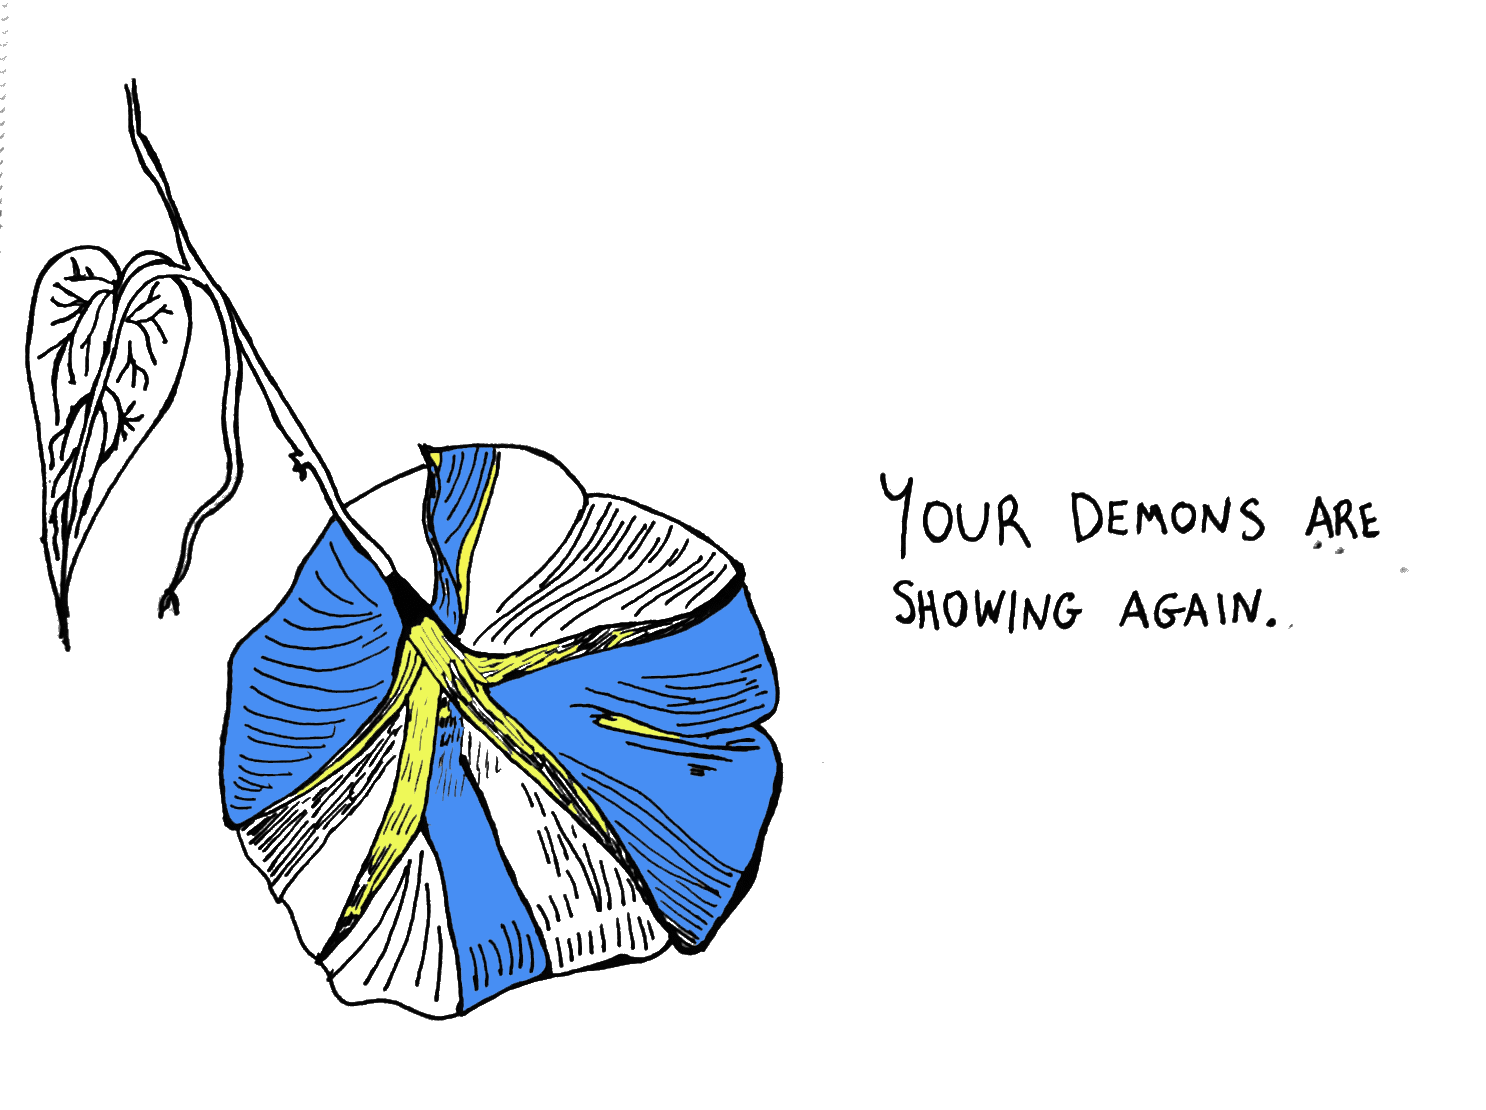 Yay Demons